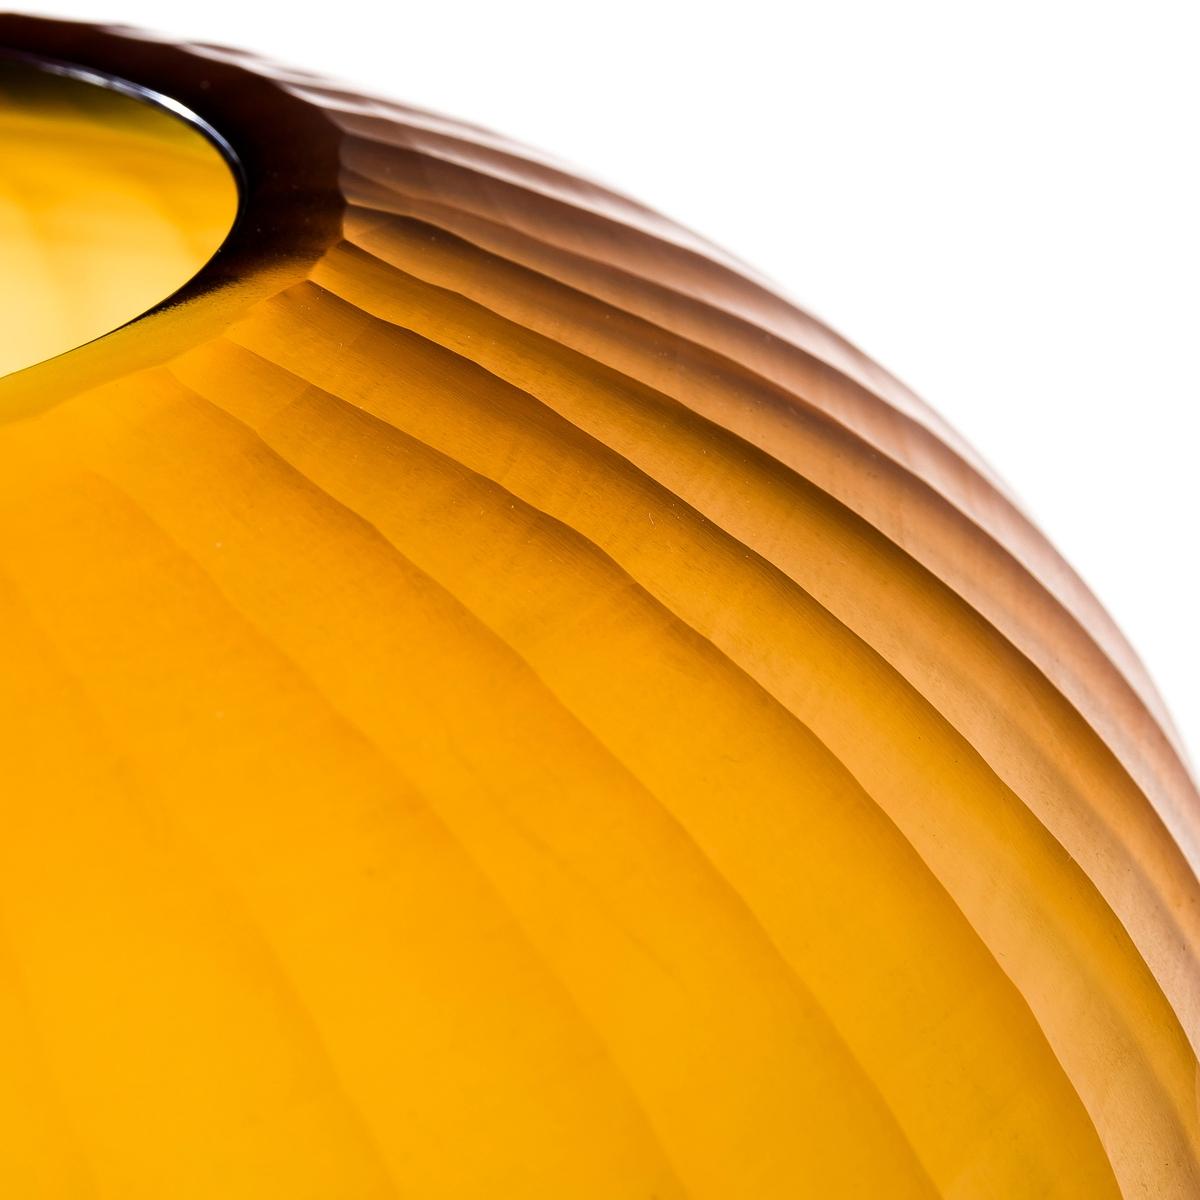 Ваза стеклянная YsalisВаза из рифленого стекла.Диаметр 24 см x Выс. 25 см.<br><br>Цвет: янтарь